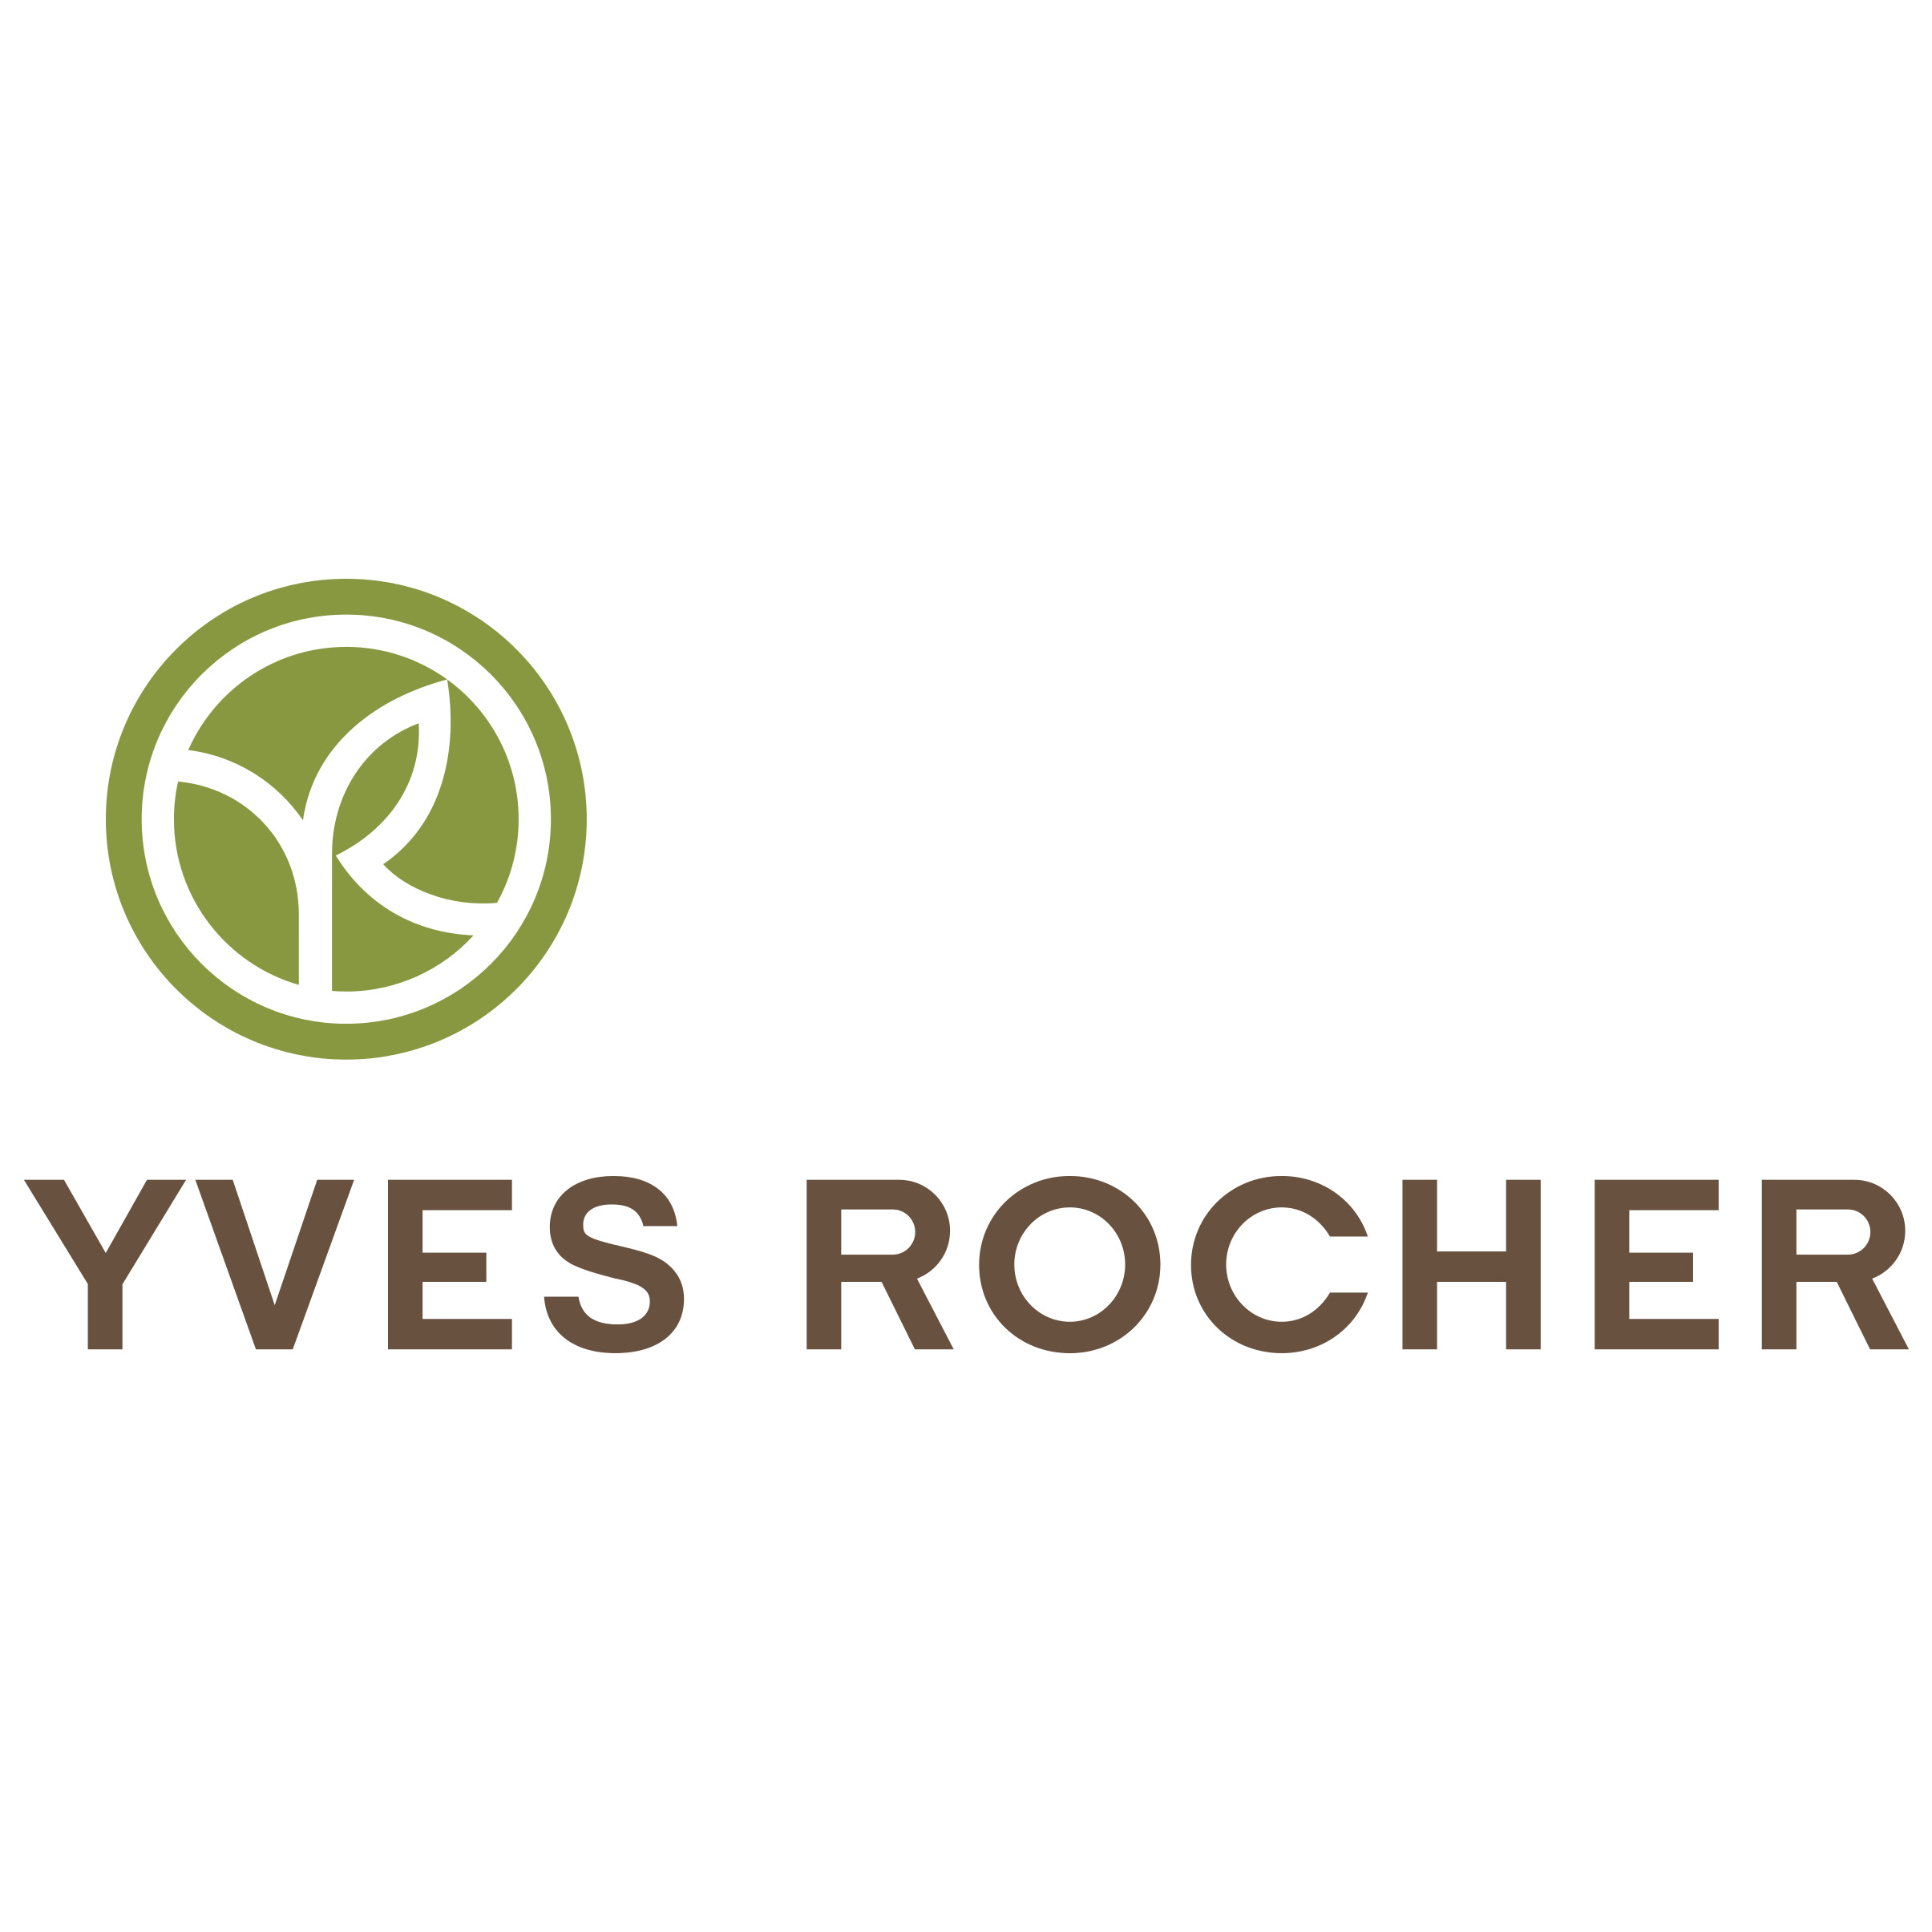 Yves rocher original